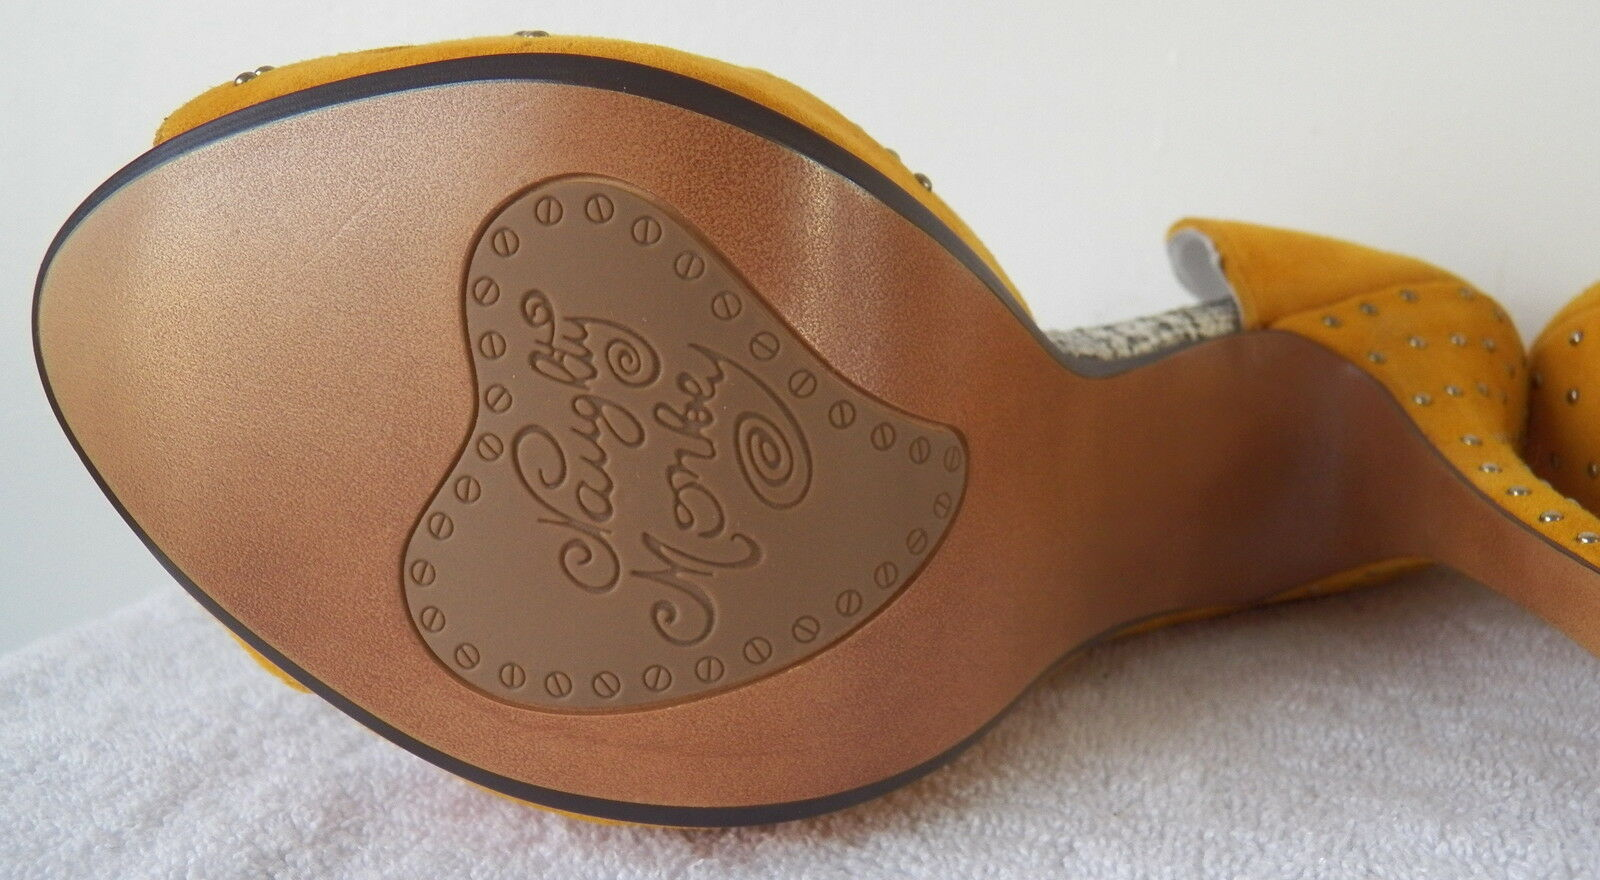 Naughty Monkey, Fiesta, Stilettos, Stilettos, Stilettos, braun Leather w Rhinestones, Größe 10 5e354e